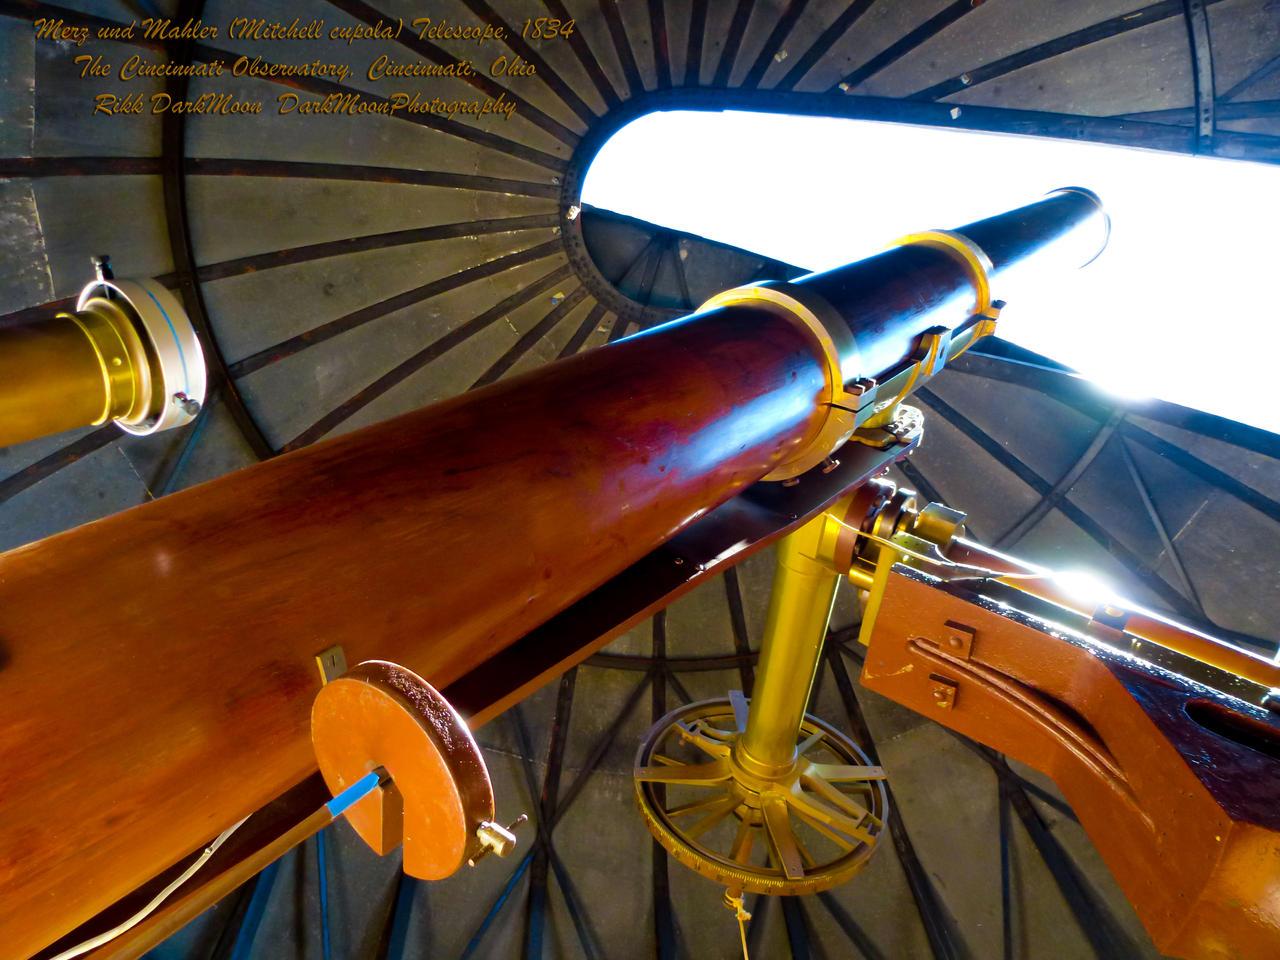 00-TheCincinnatiObservatory-P1090602-2-WP-Mast by darkmoonphoto